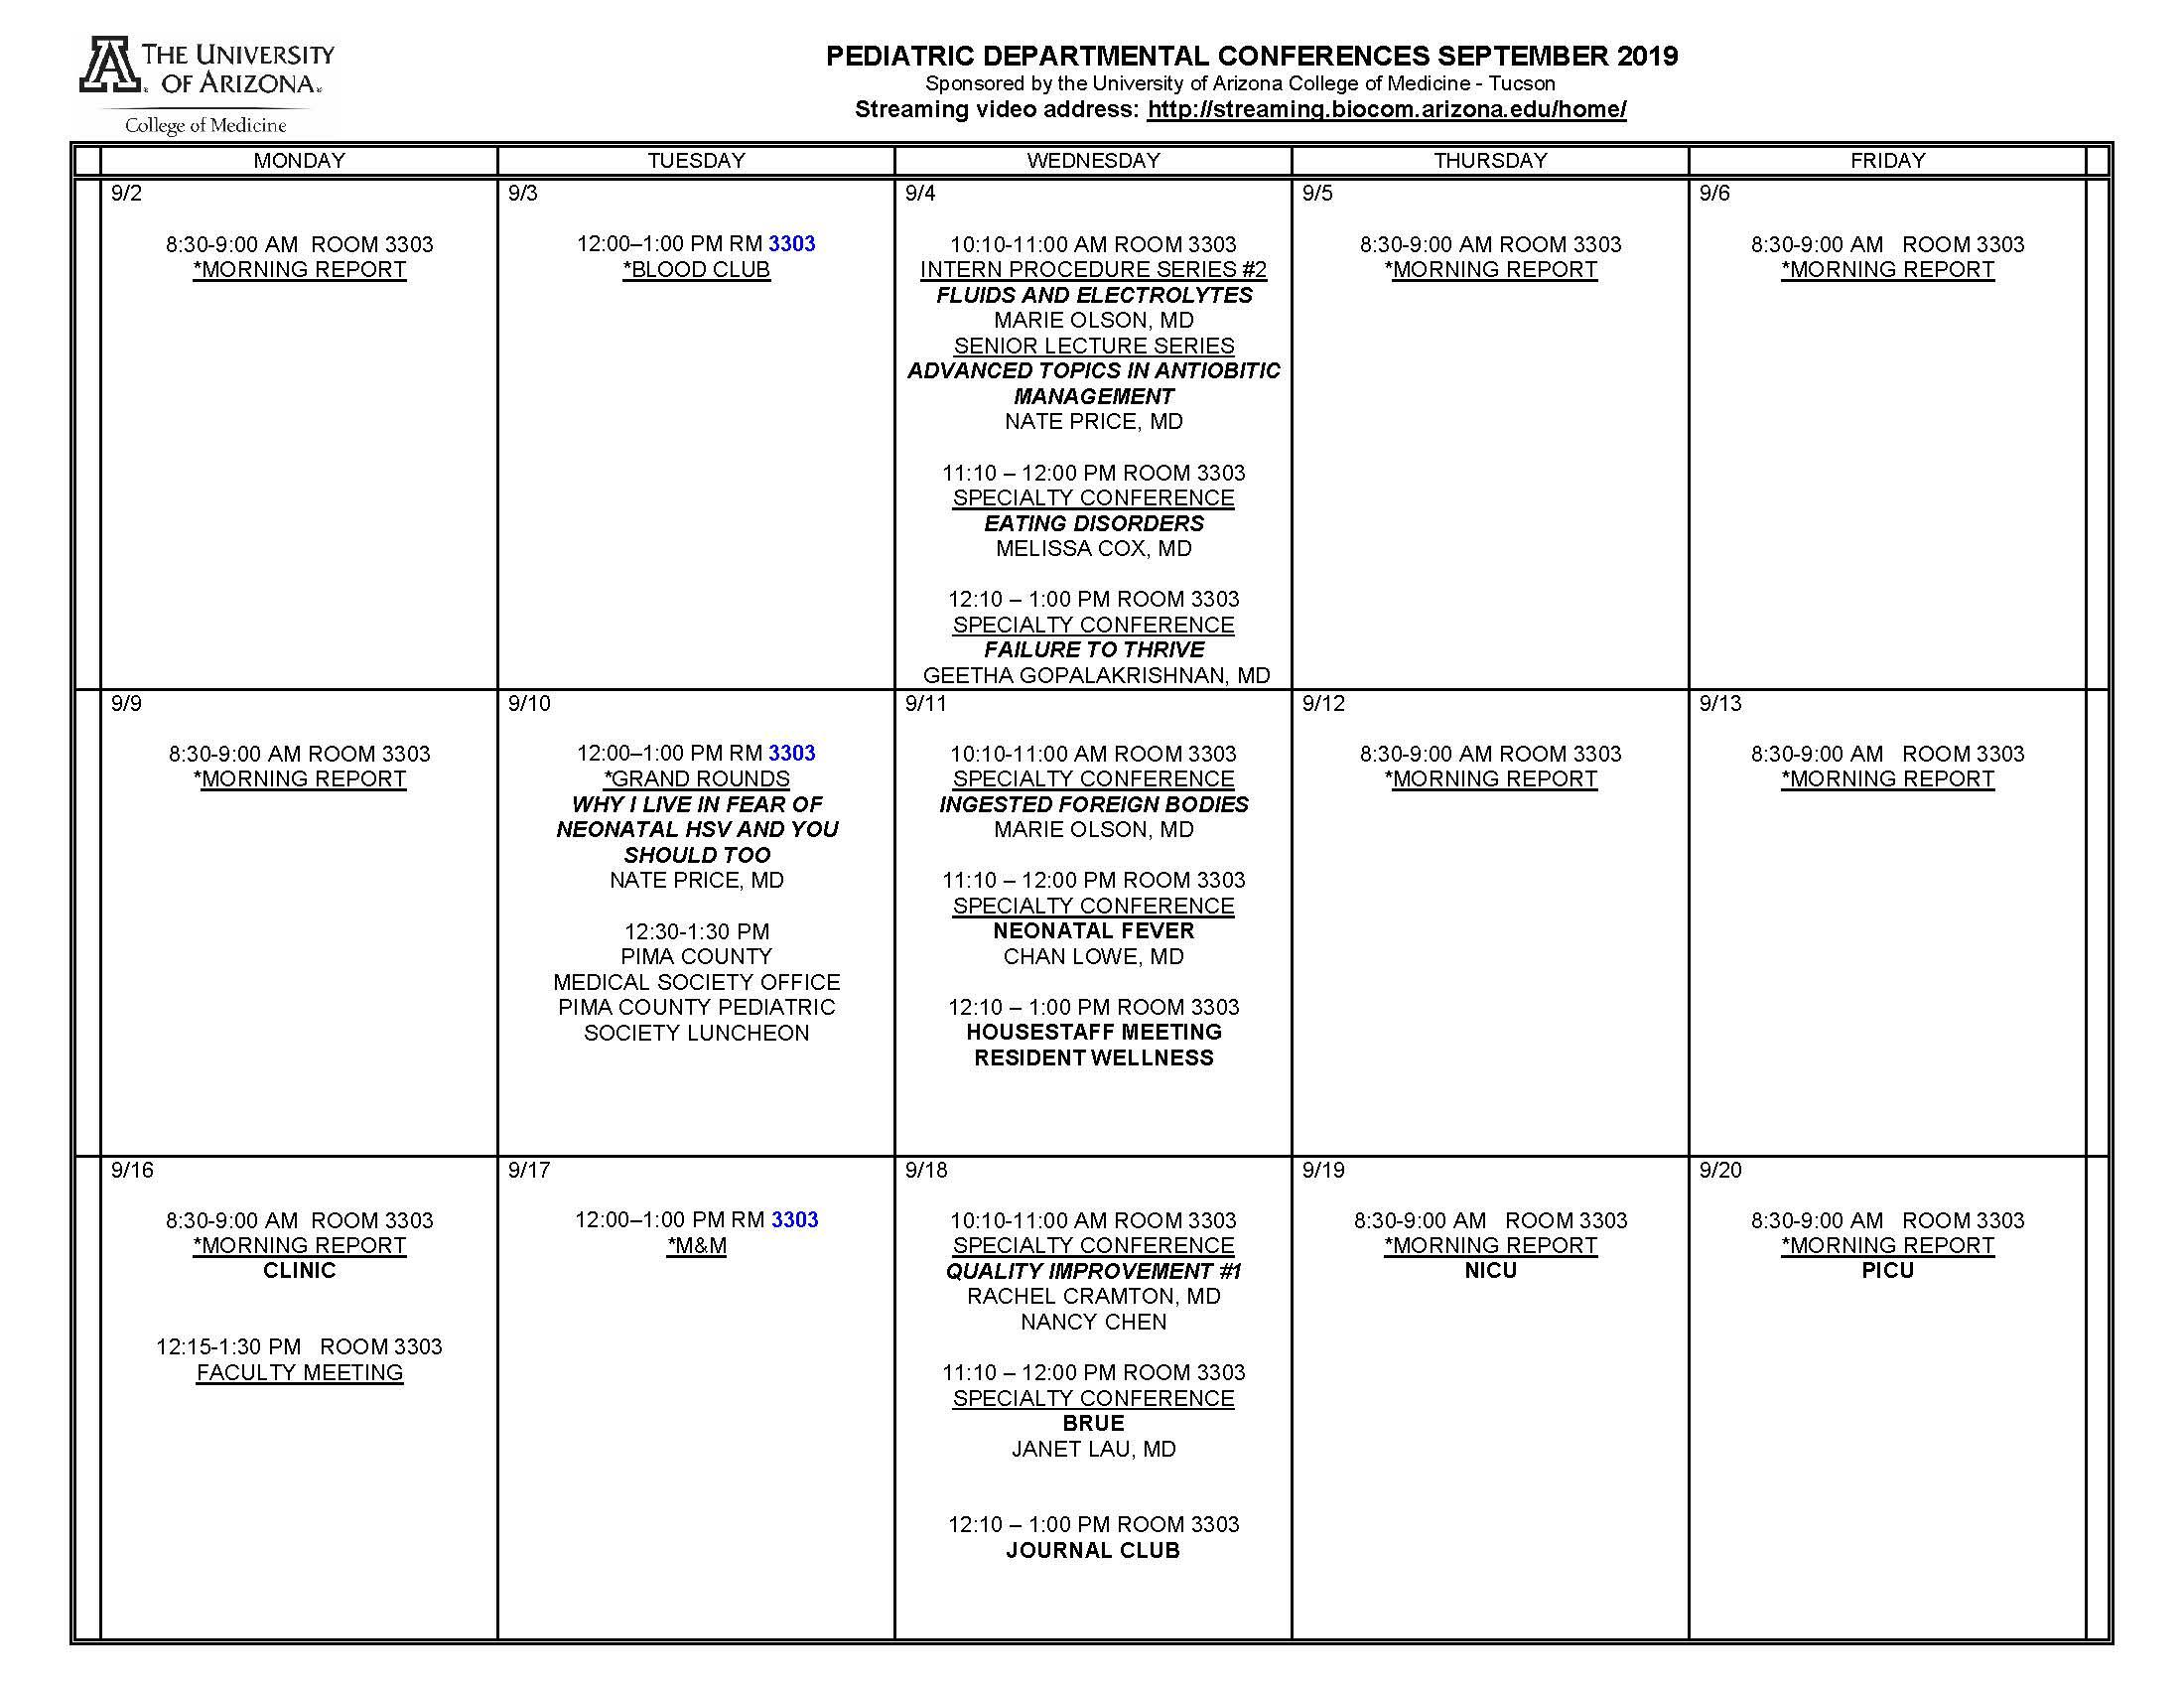 Pediatric Conference Calendar | University of Arizona